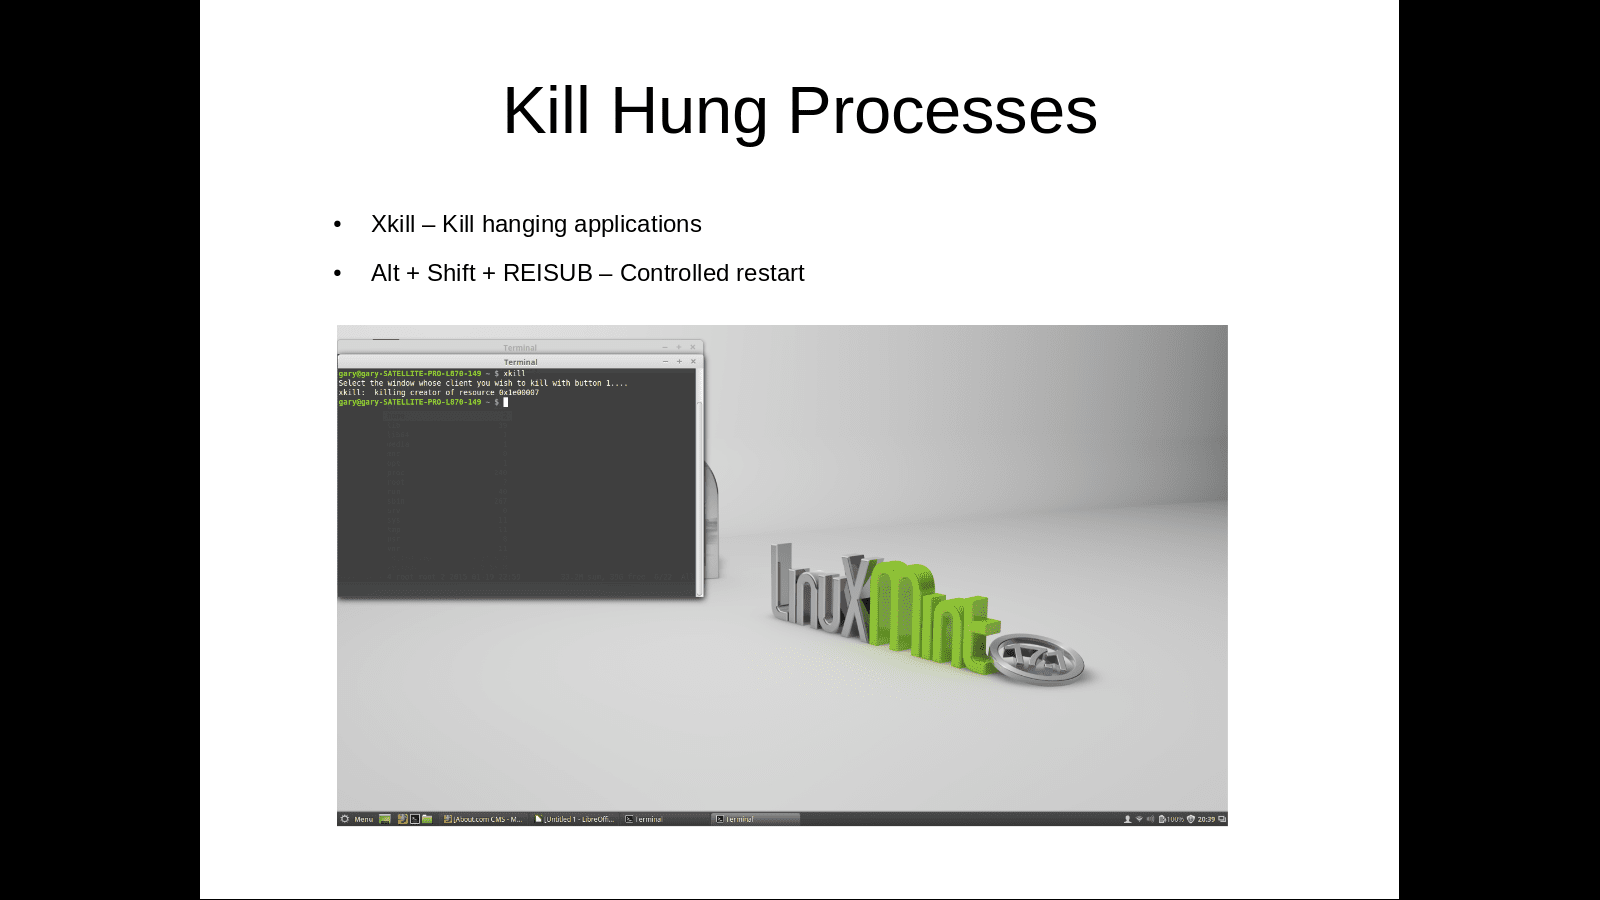 Kill Hung processes with XKill